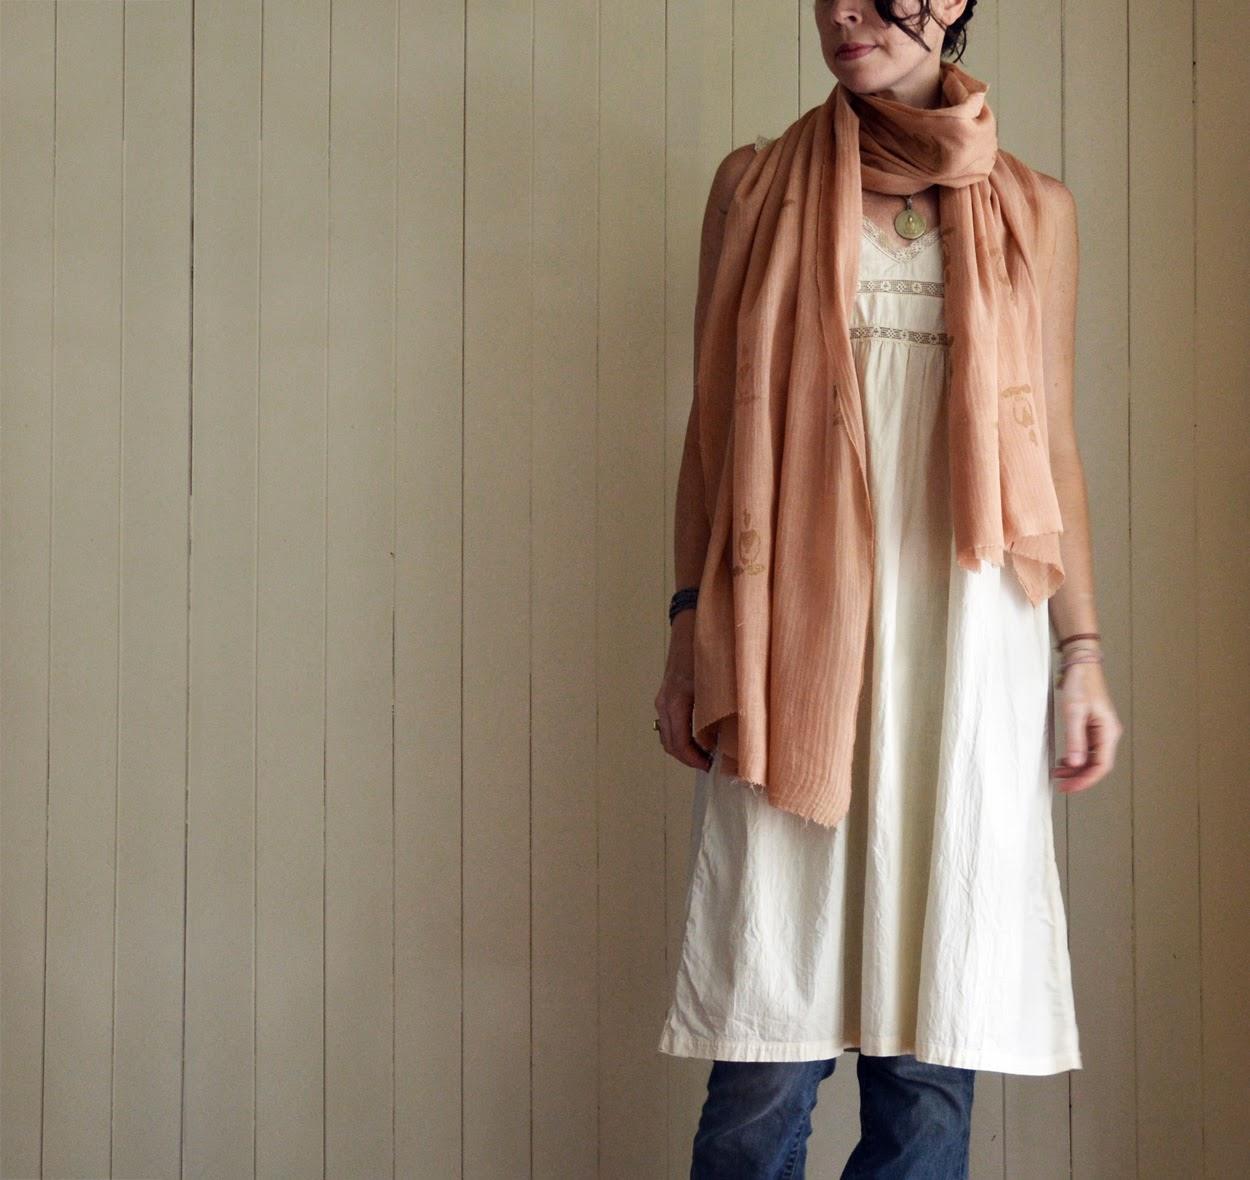 untold imprint naturally dye scarf